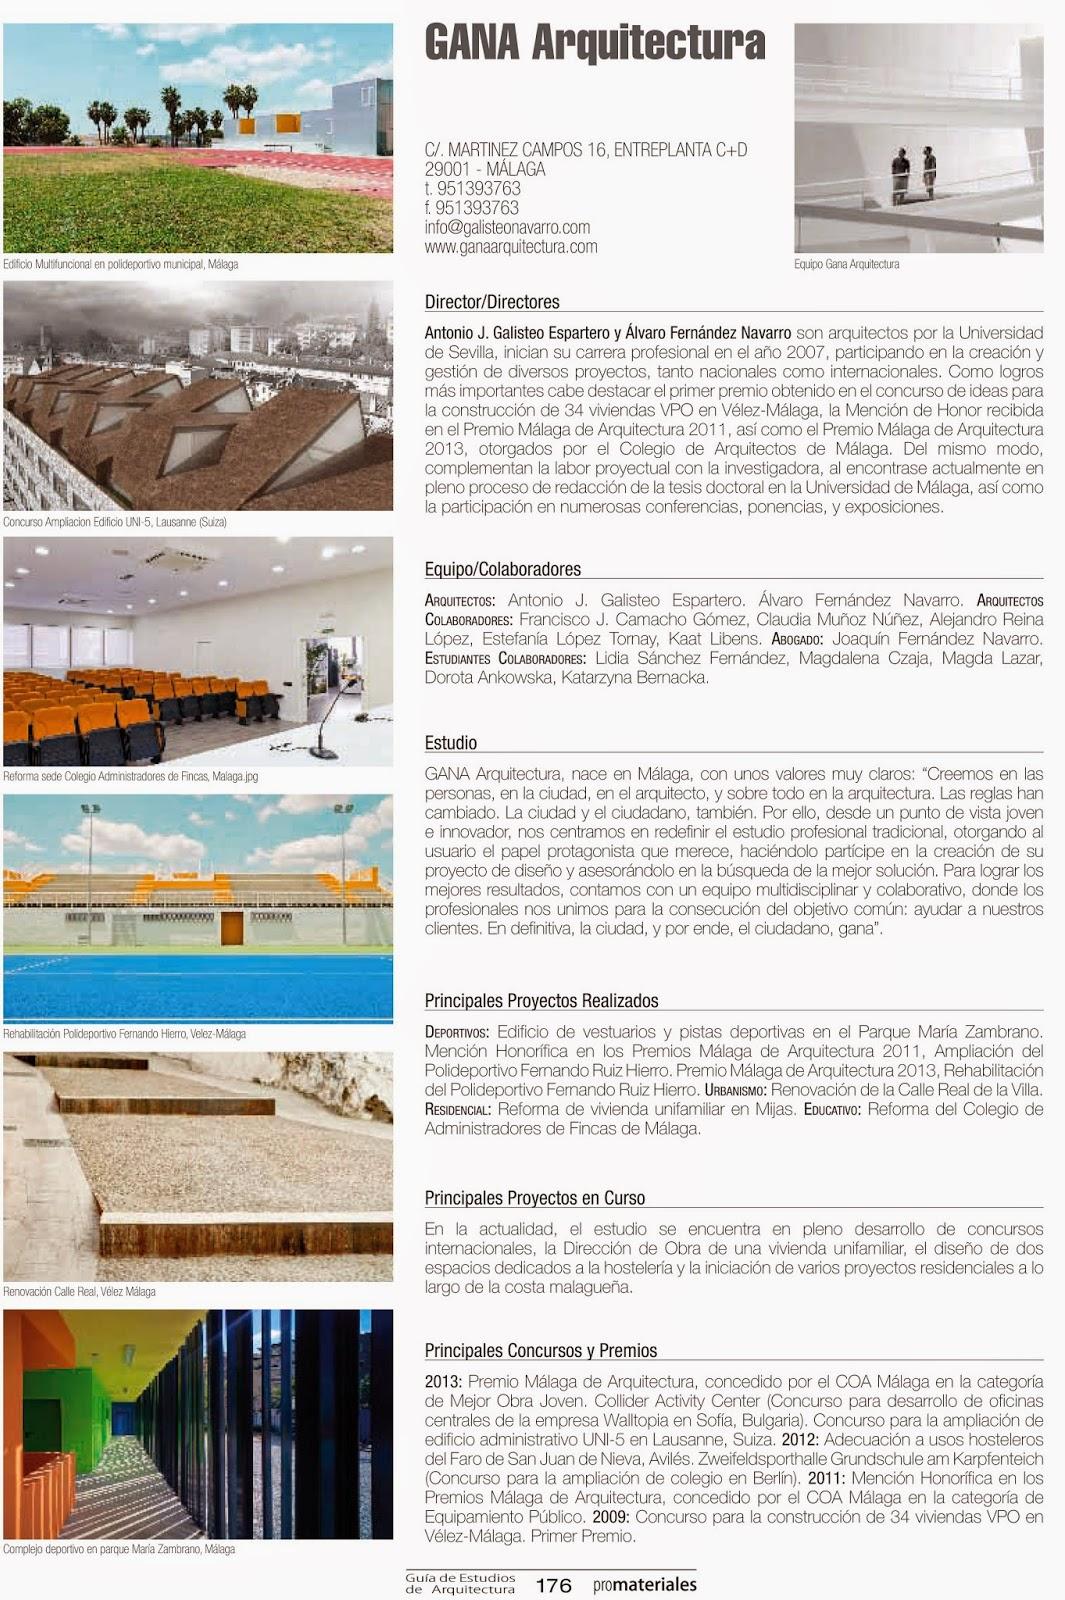 Departamento de edificaci n gana arquitectura colabora en for Practicas estudio arquitectura